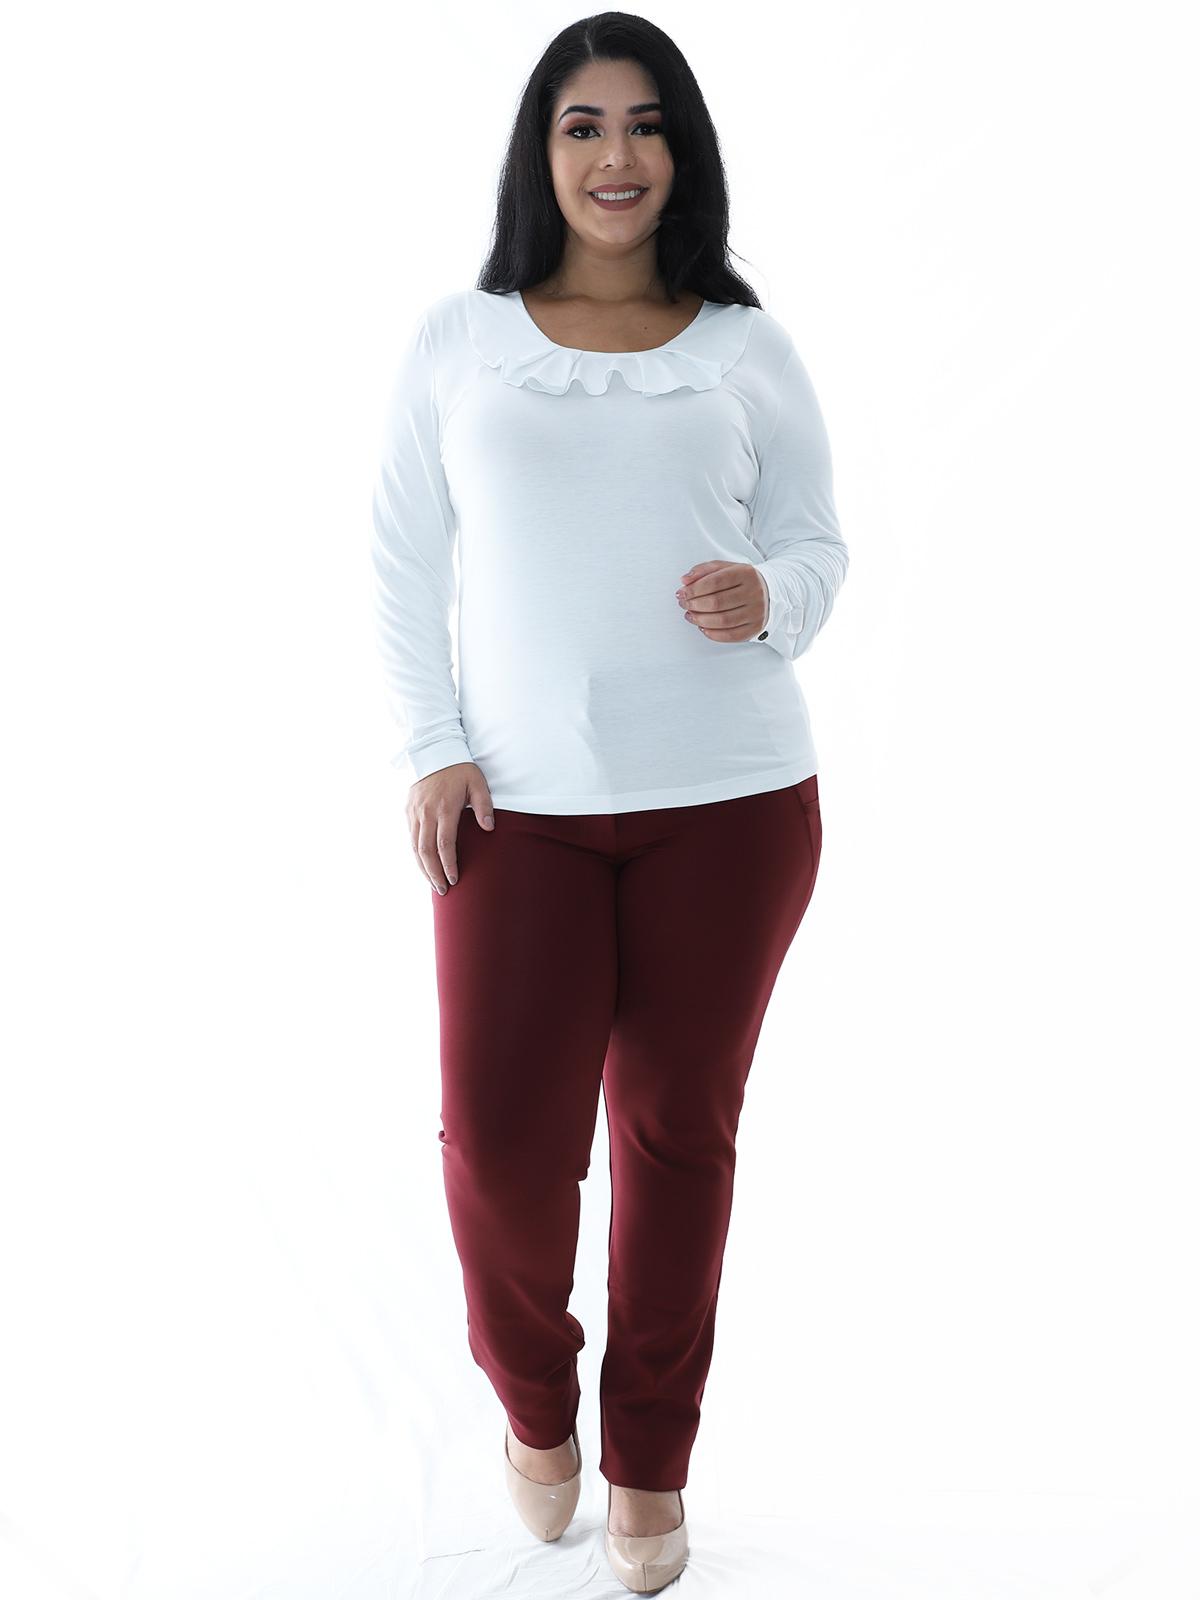 Blusa Plus Size Feminina Manga Longa Decote Redondo Branca